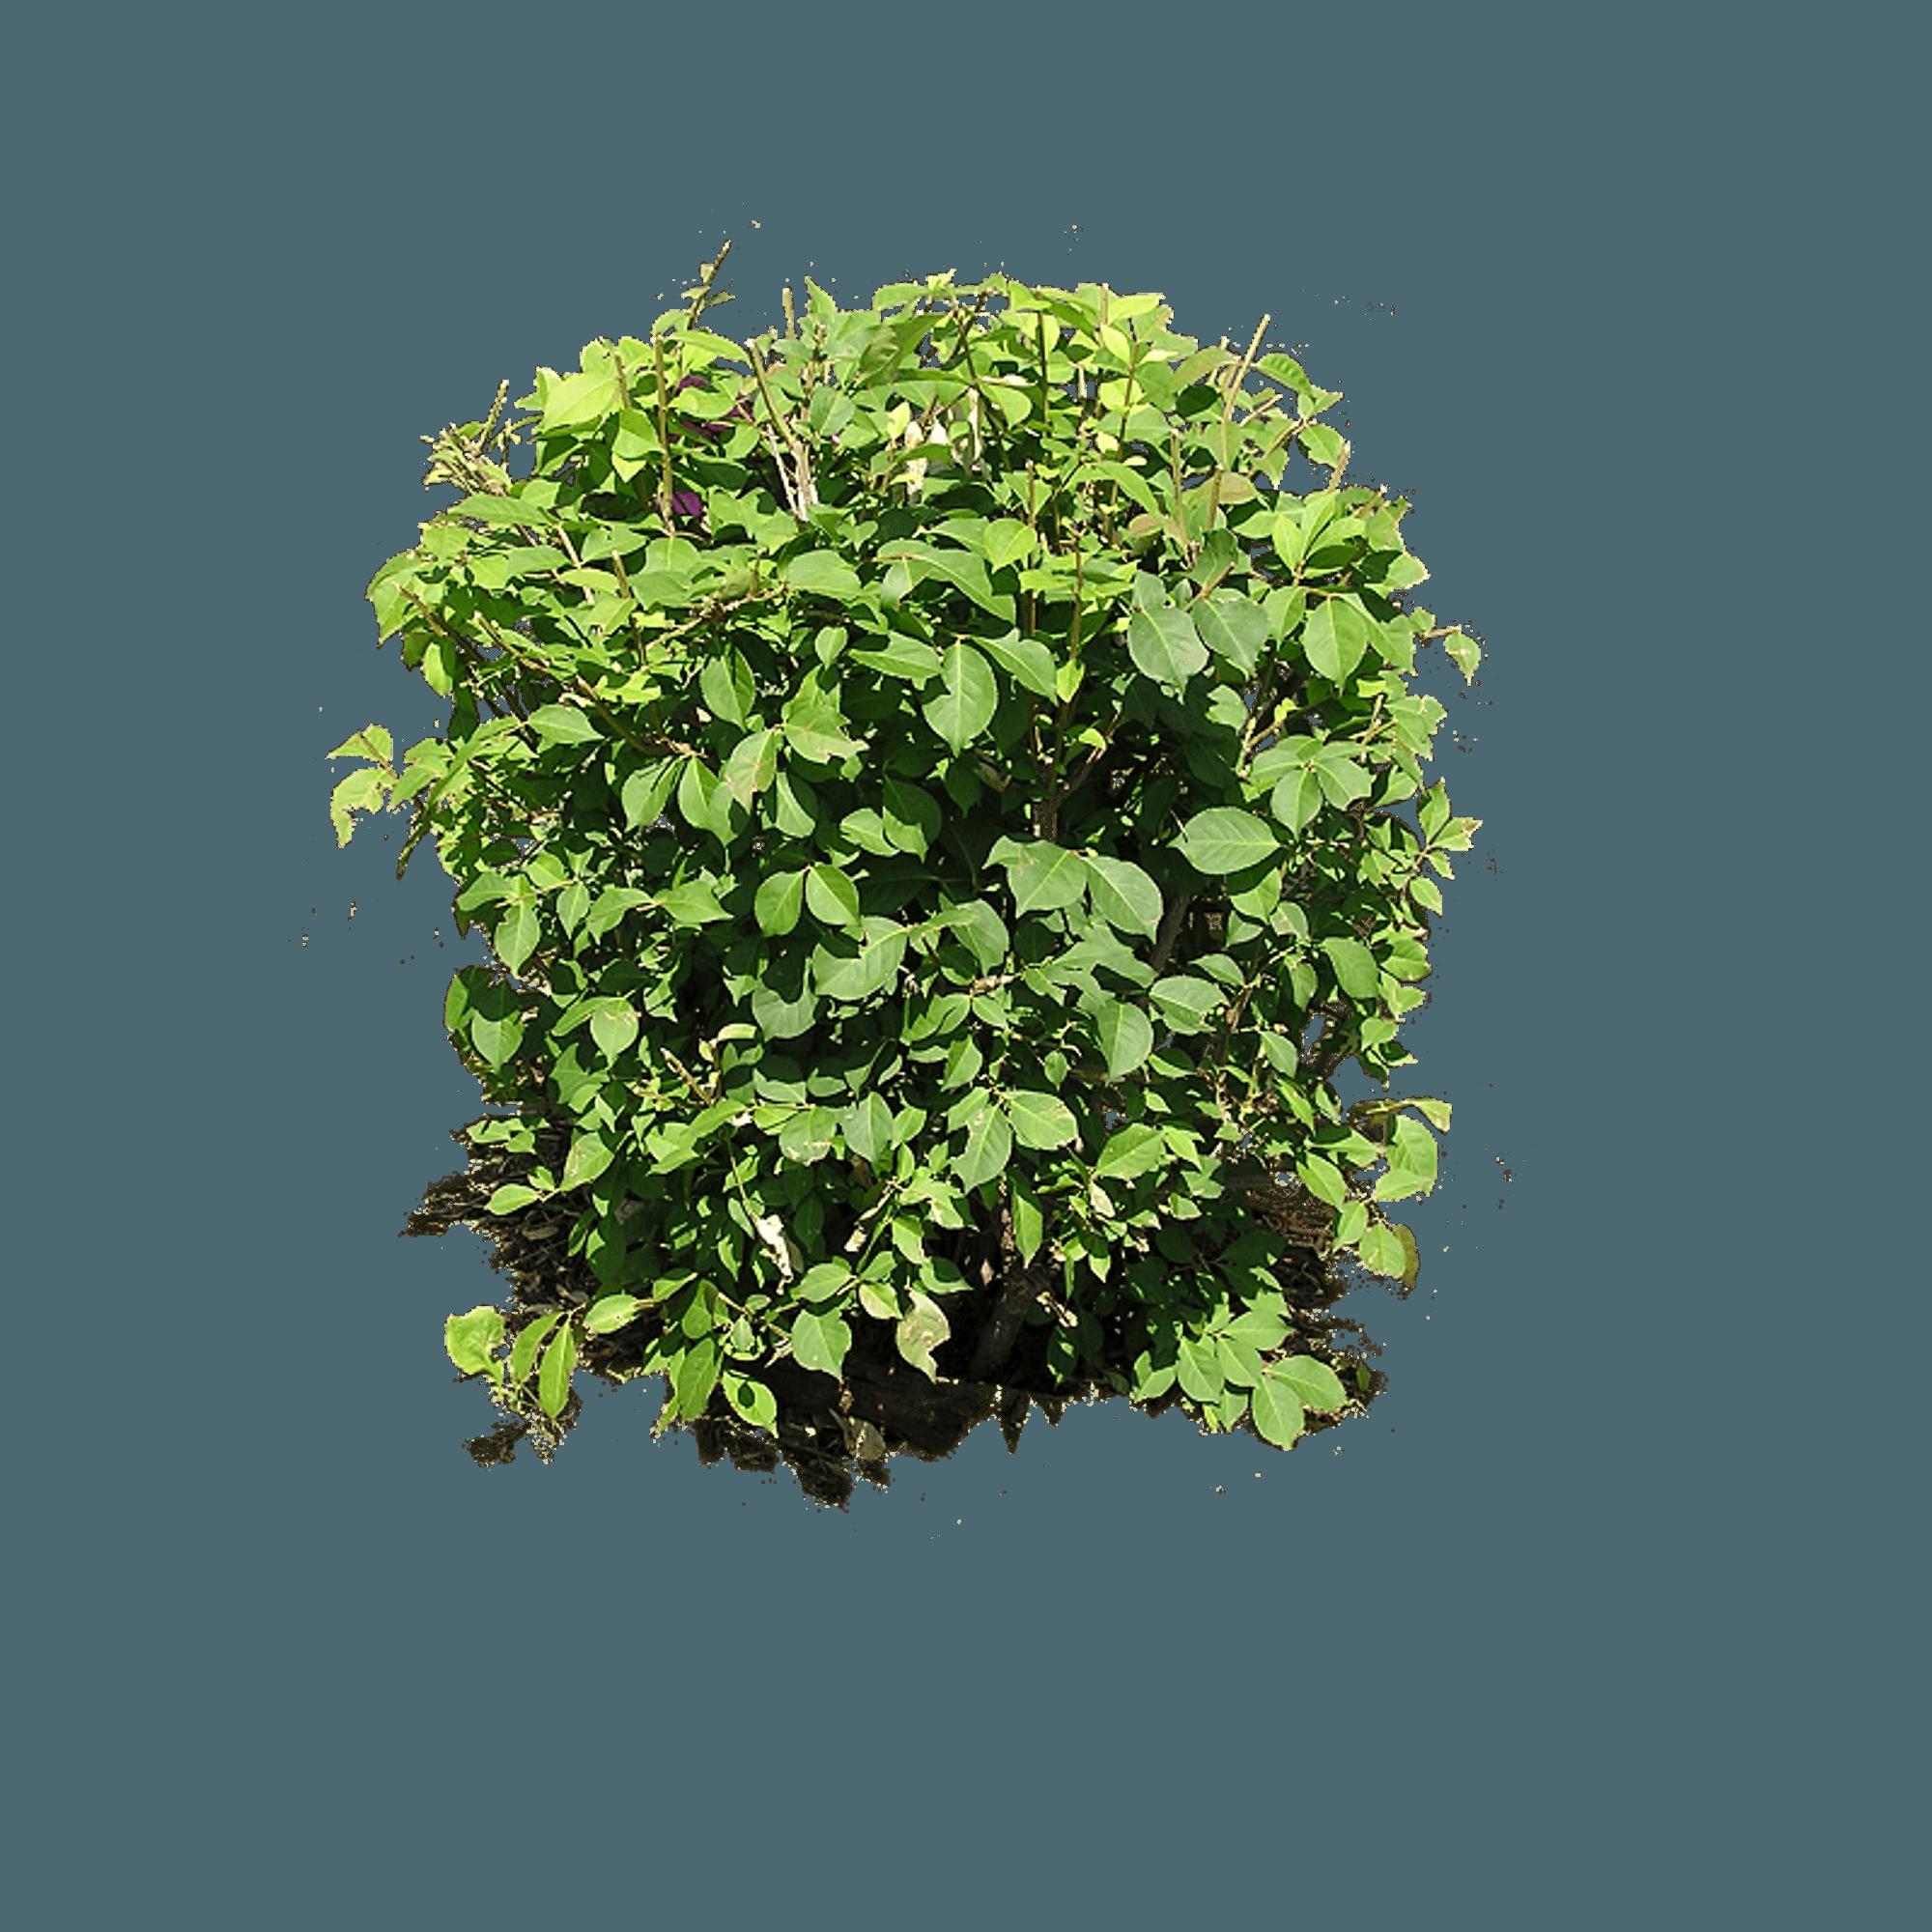 Shrub Bushes PNG - 1544